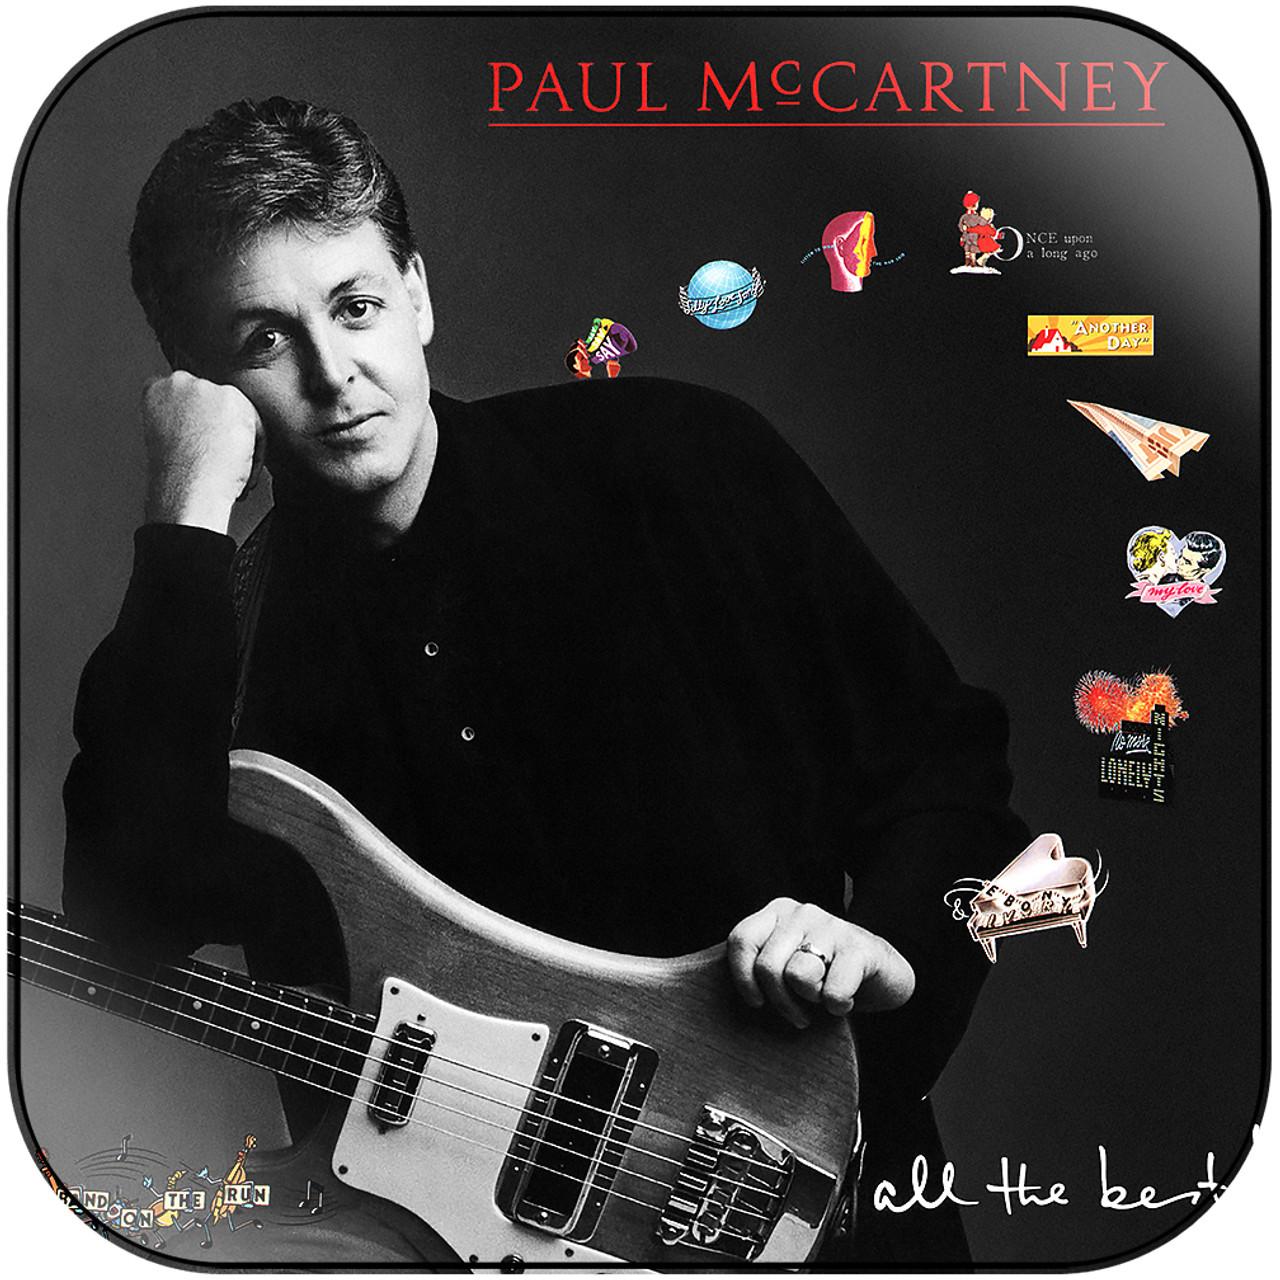 Paul McCartney - All The Best Album Cover Sticker